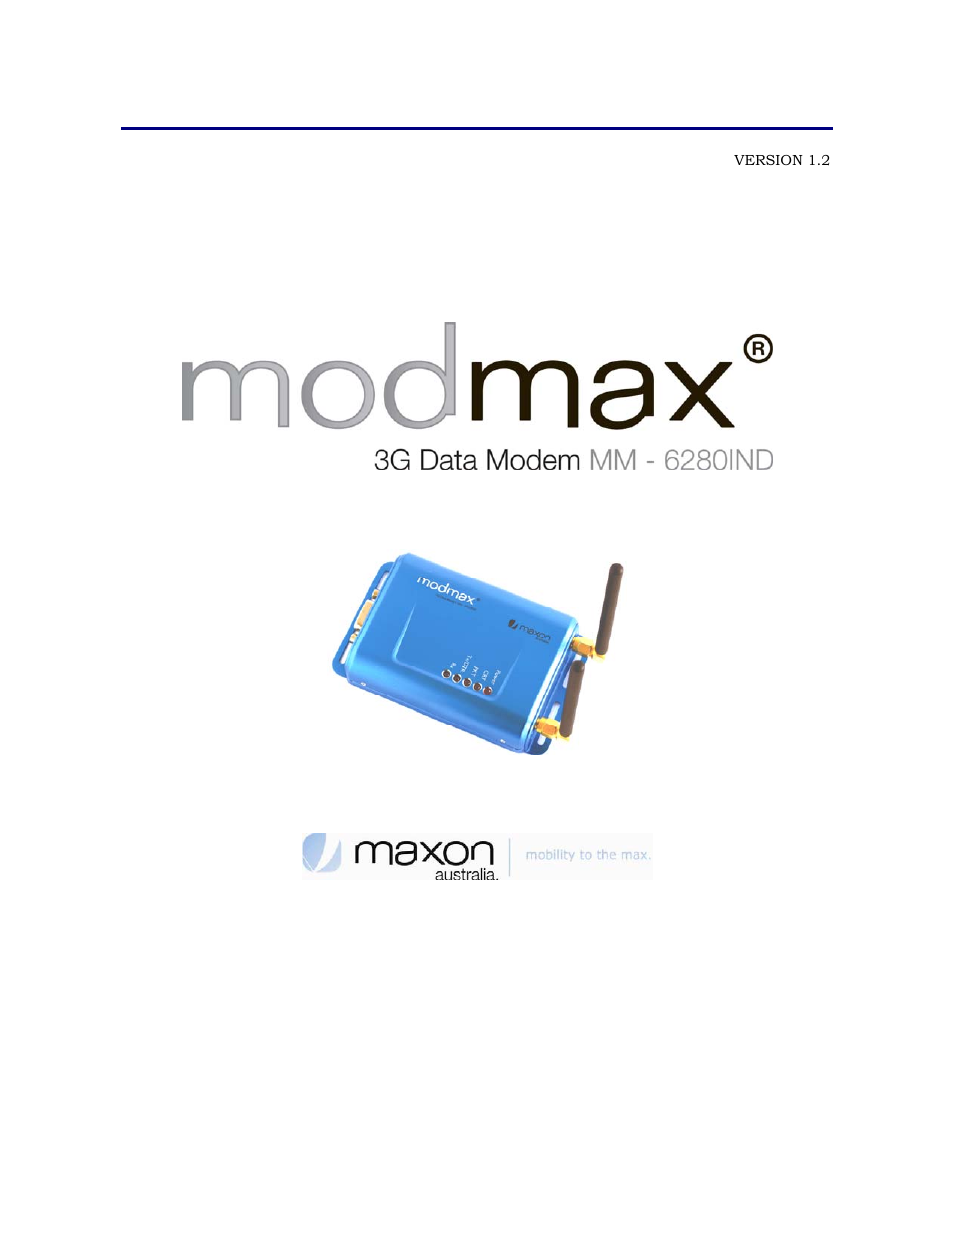 Maxon Manual Bmraw 44 Wiring Diagram Array Telecom Modmax Mm 6280ind User 61 Pages Rh Manualsdir